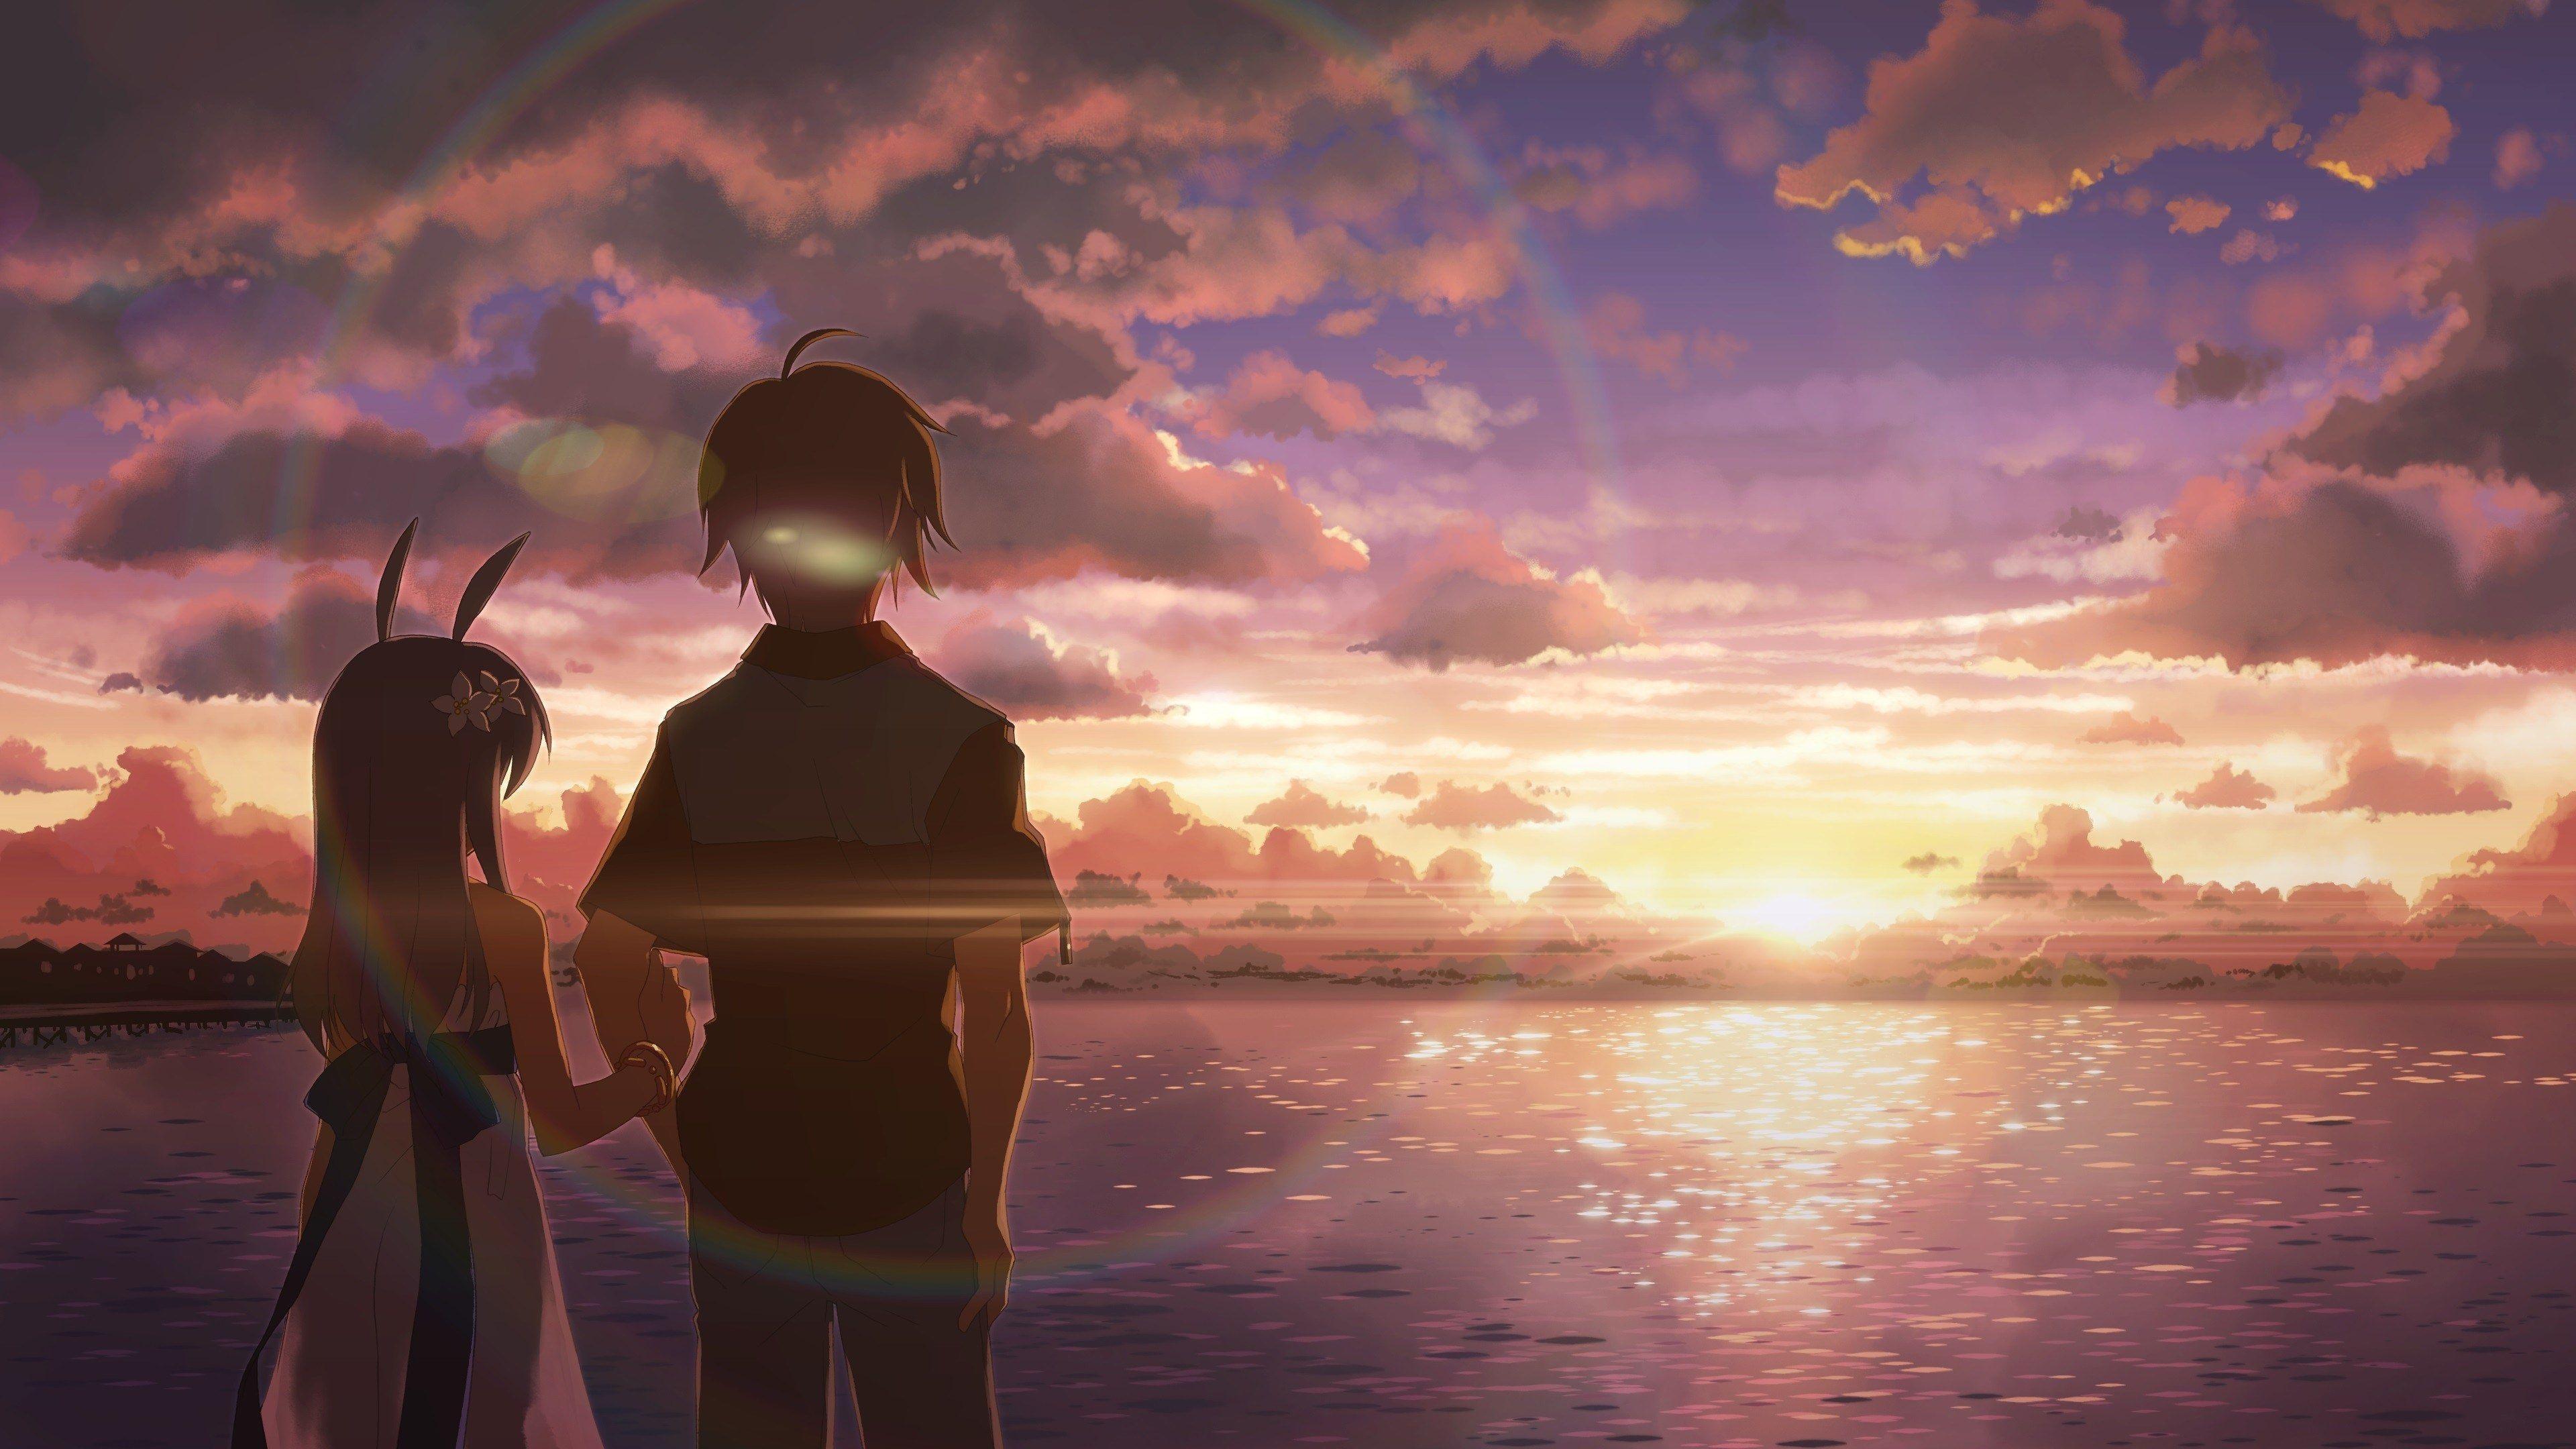 3840x2160 Anime 4k Hd Quality Desktop Wallpaper Anime Art Beautiful Anime Scenery Sunrise Wallpaper